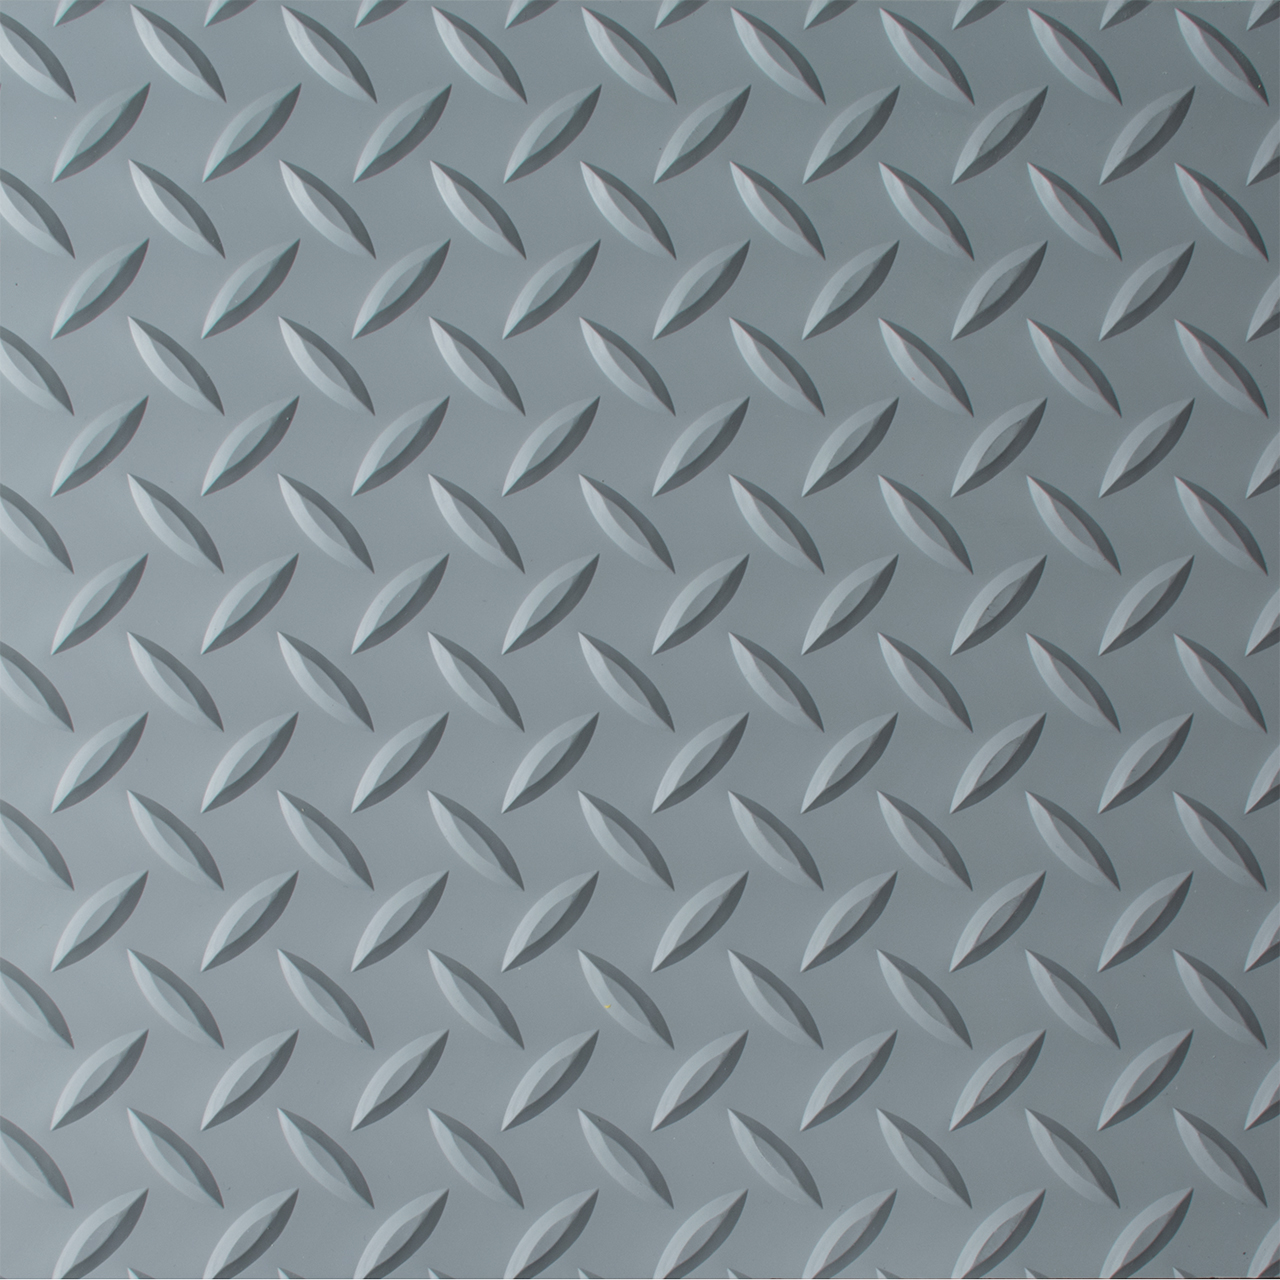 Deckplate Matting Gray